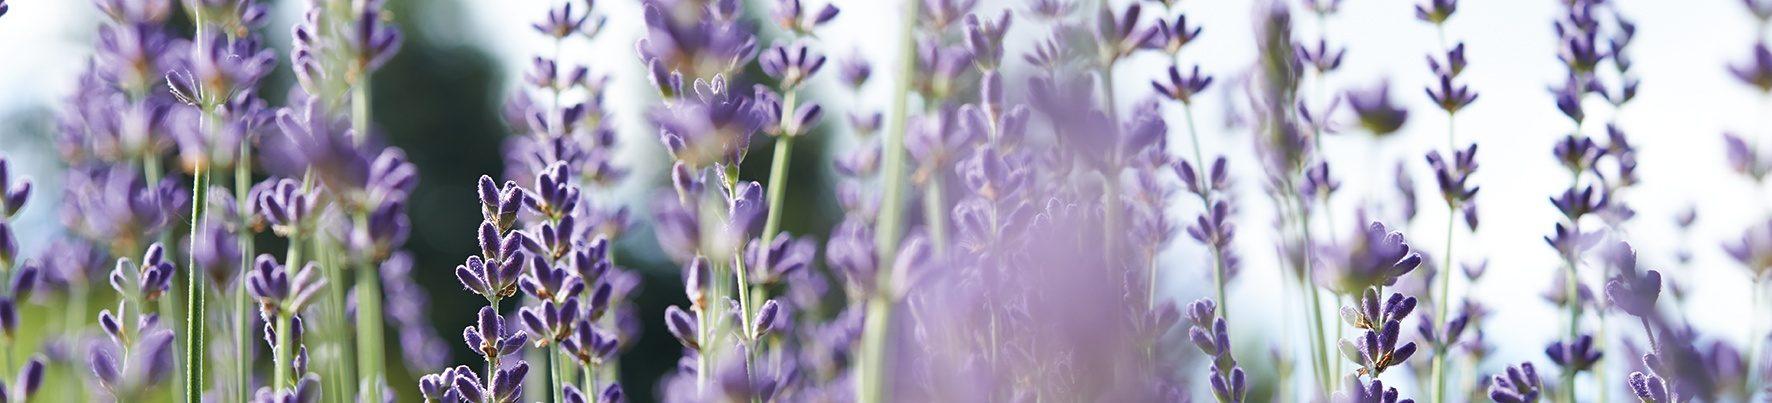 Nerola Organic Treatments